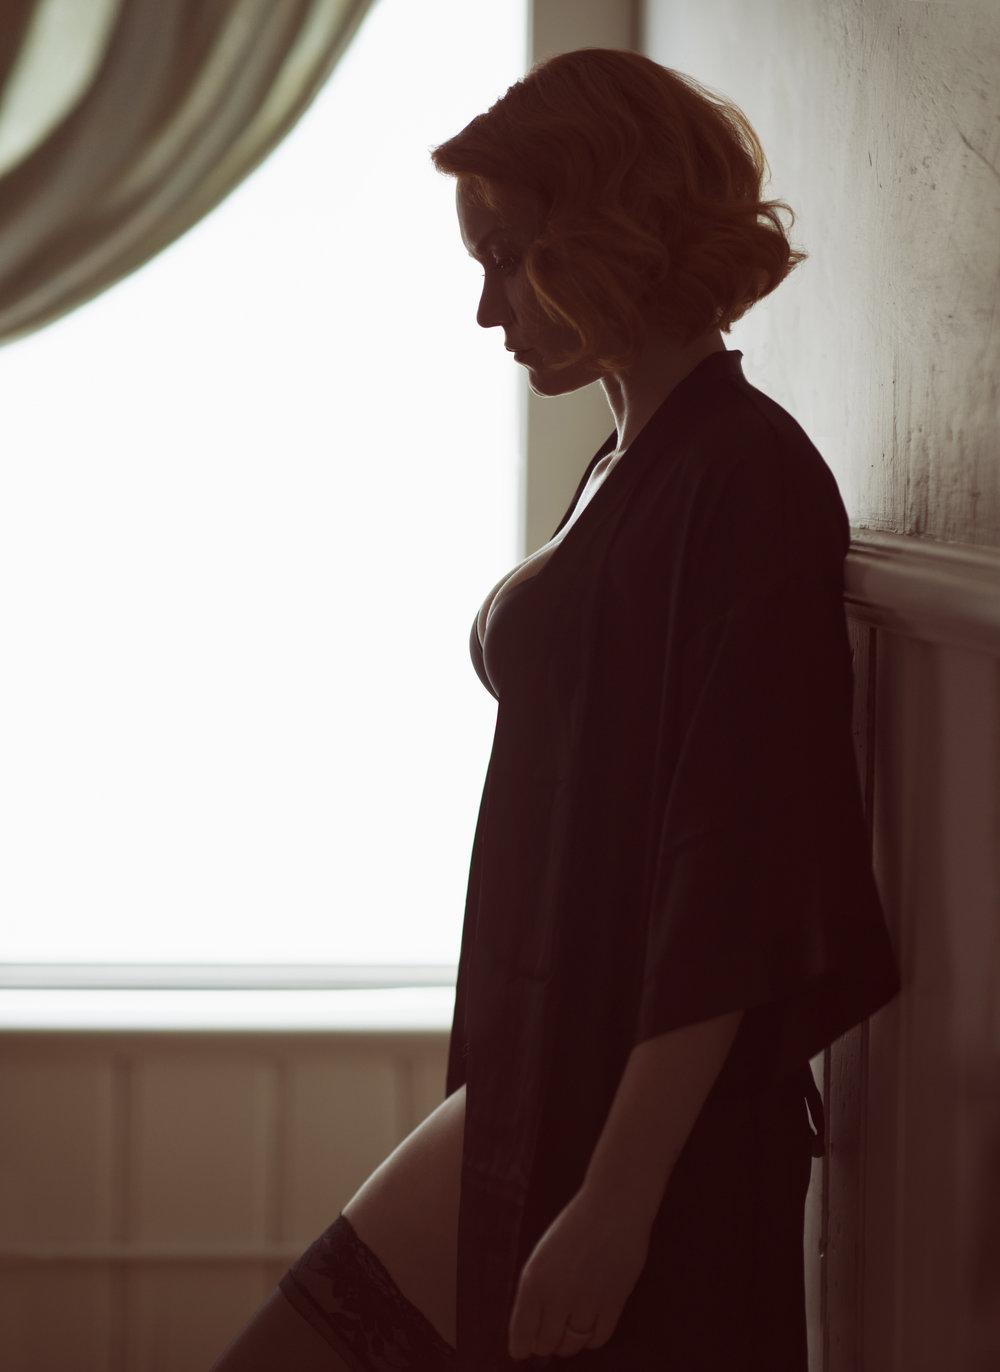 Marta-Hewson-Kim-Murkovich-boudoir-silhouette.jpg